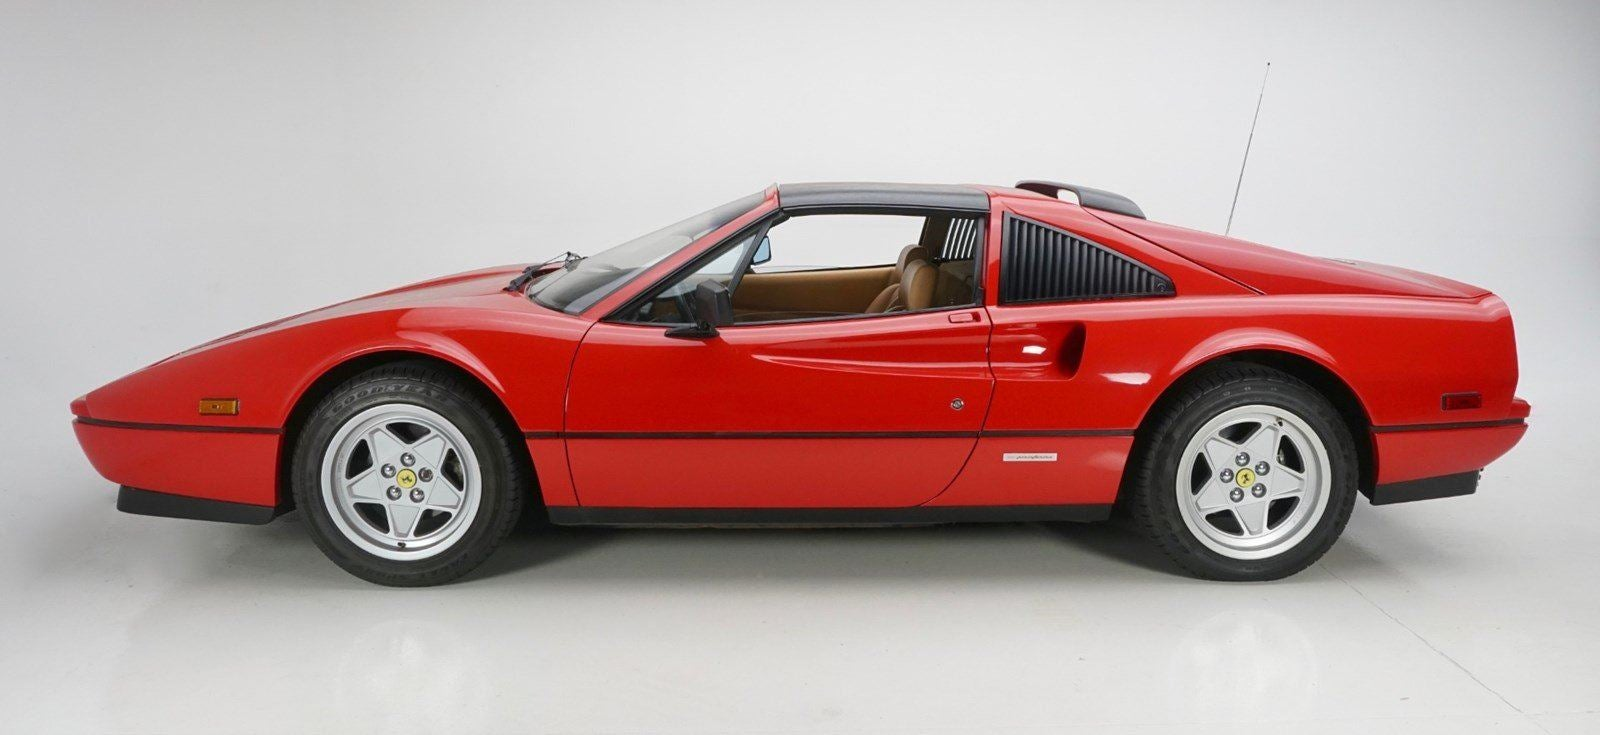 Ferrari Dealership Nc >> 1988 Ferrari 328GTS Charlotte NC | Cornelius Davidson Huntersville North Carolina ZFFXA20A4J0075061